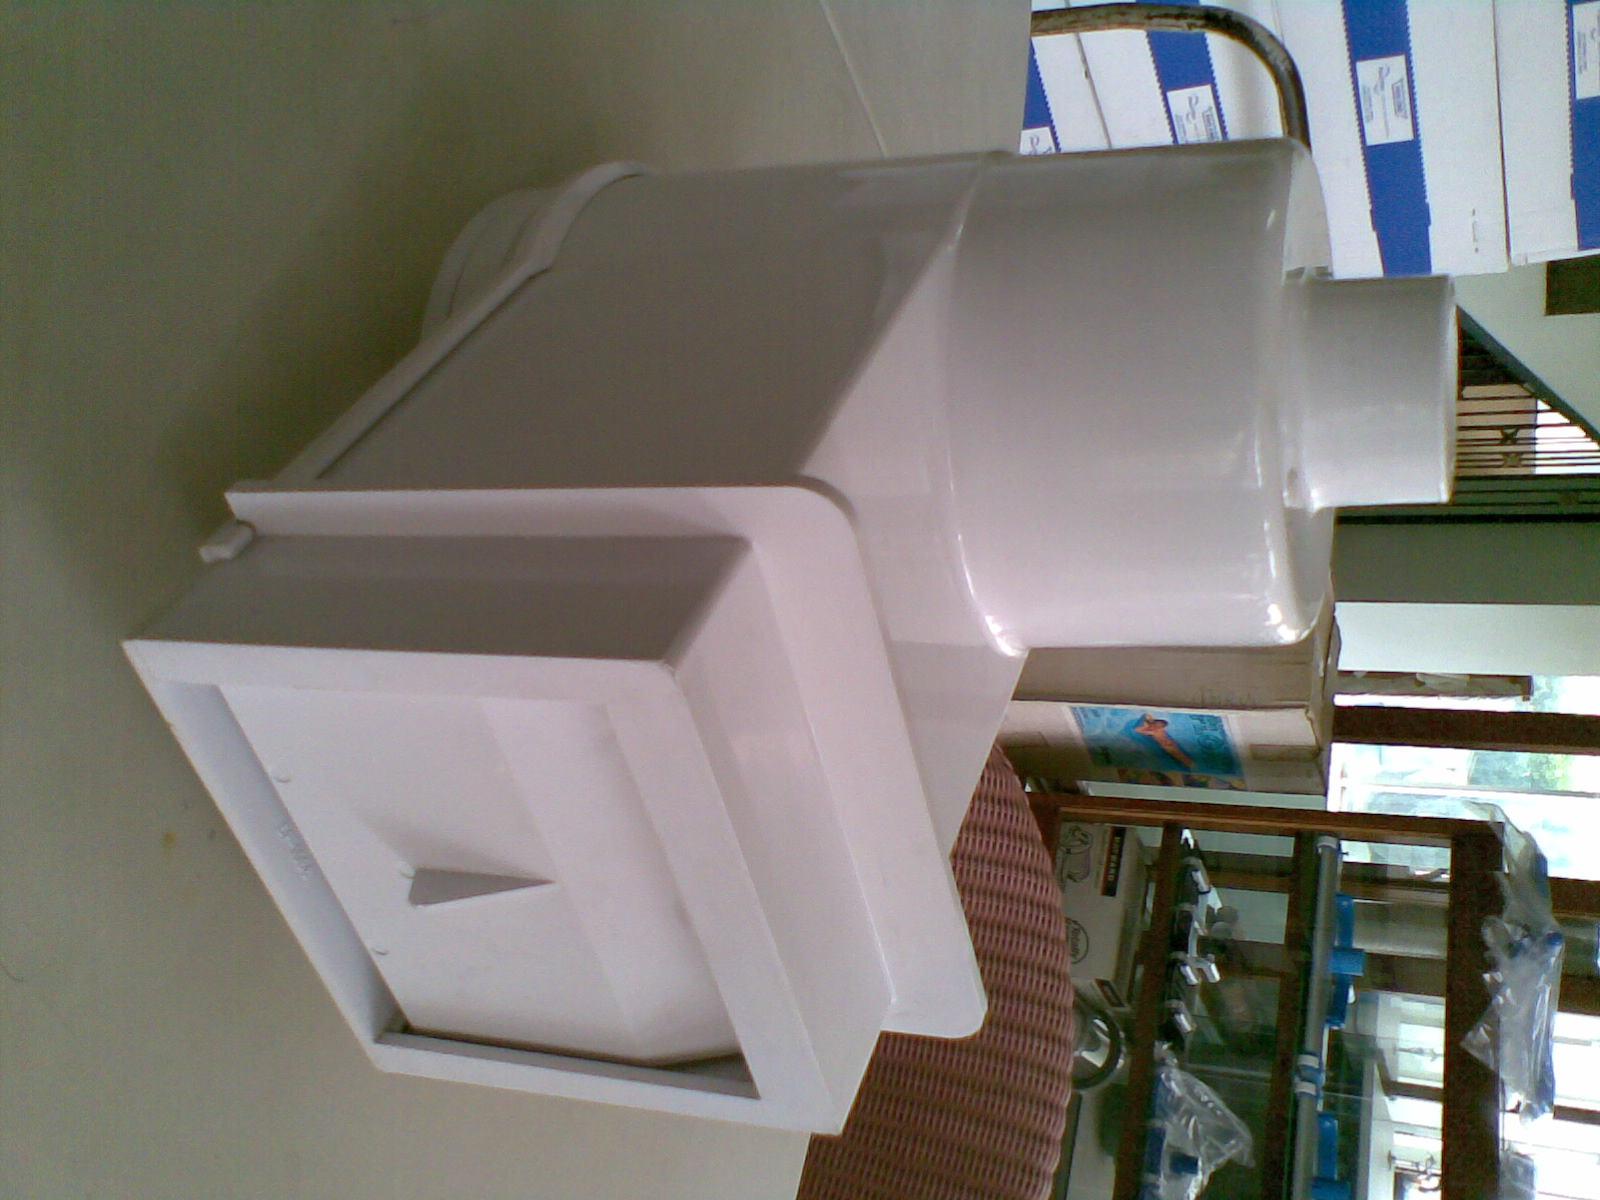 Skimmer Box Hayward Fantasia Pool Shop Toko Peralatan Kolam Grating Grill Renang